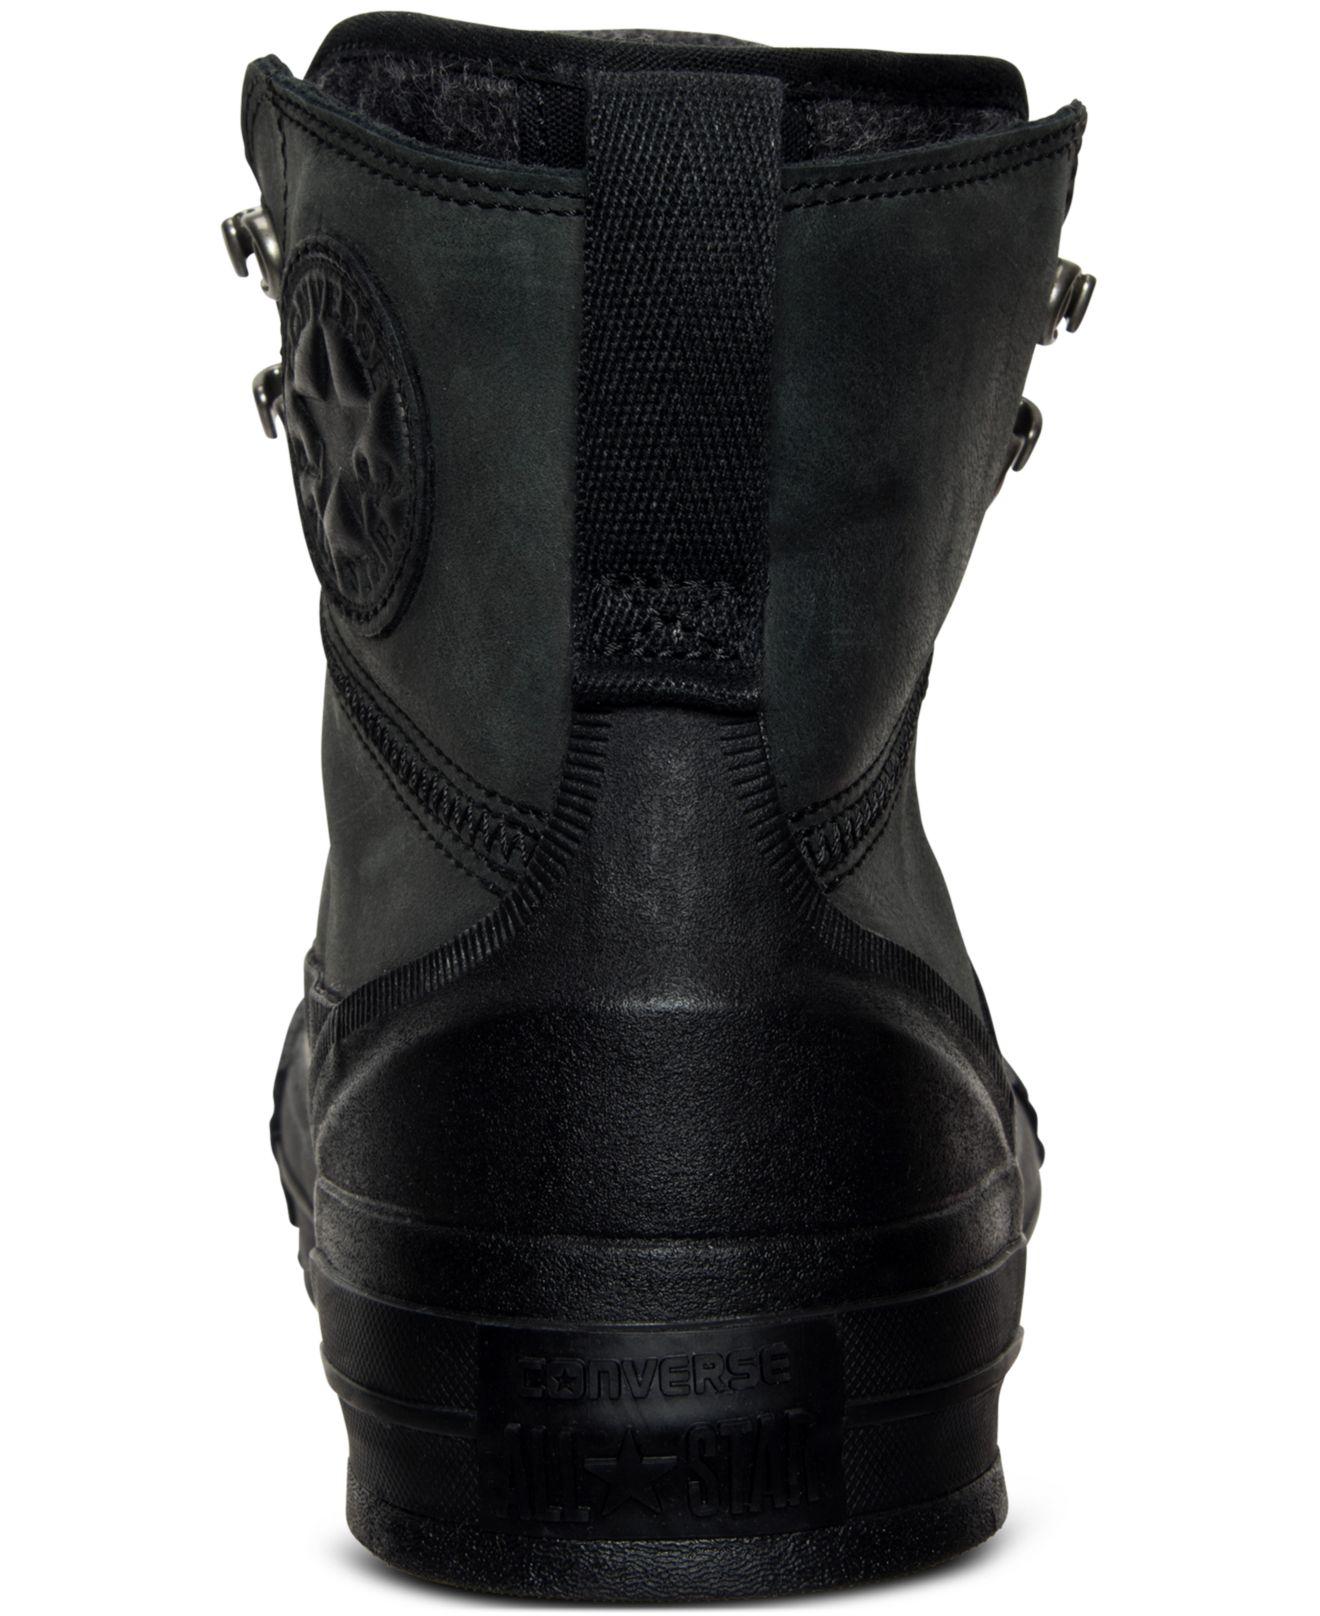 Converse Men S Chuck Taylor All Star Tekoa Boots From